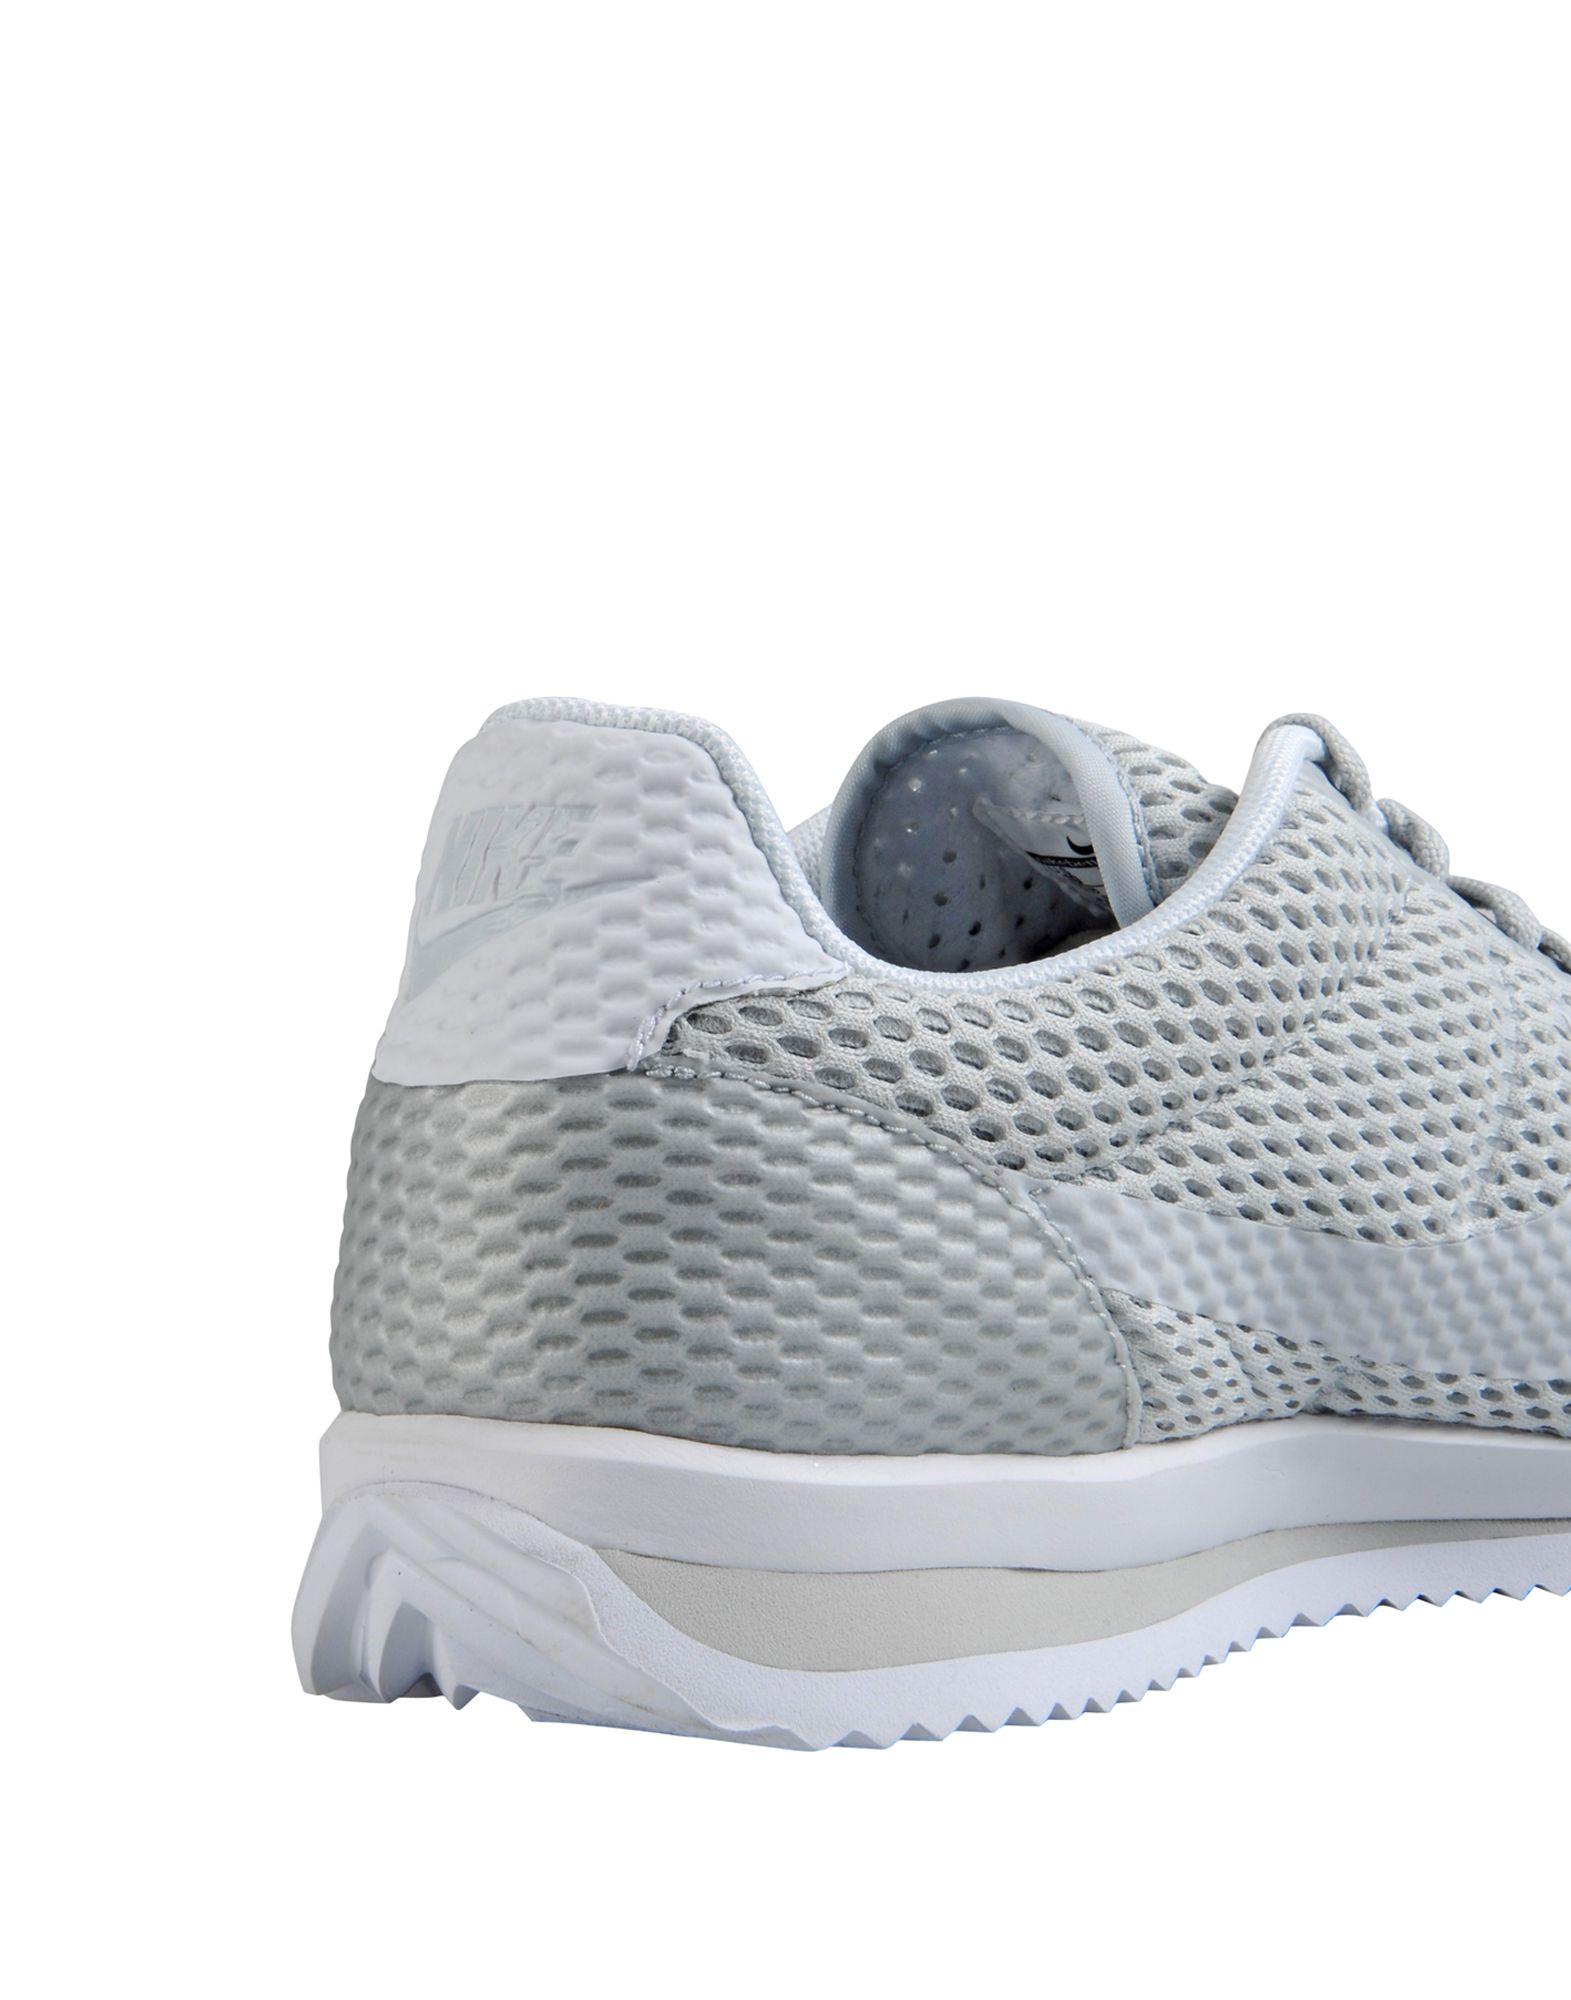 Rabatt Cortez echte Schuhe Nike Nike Cortez Rabatt Ultra Br  11060659JT 5cf9af